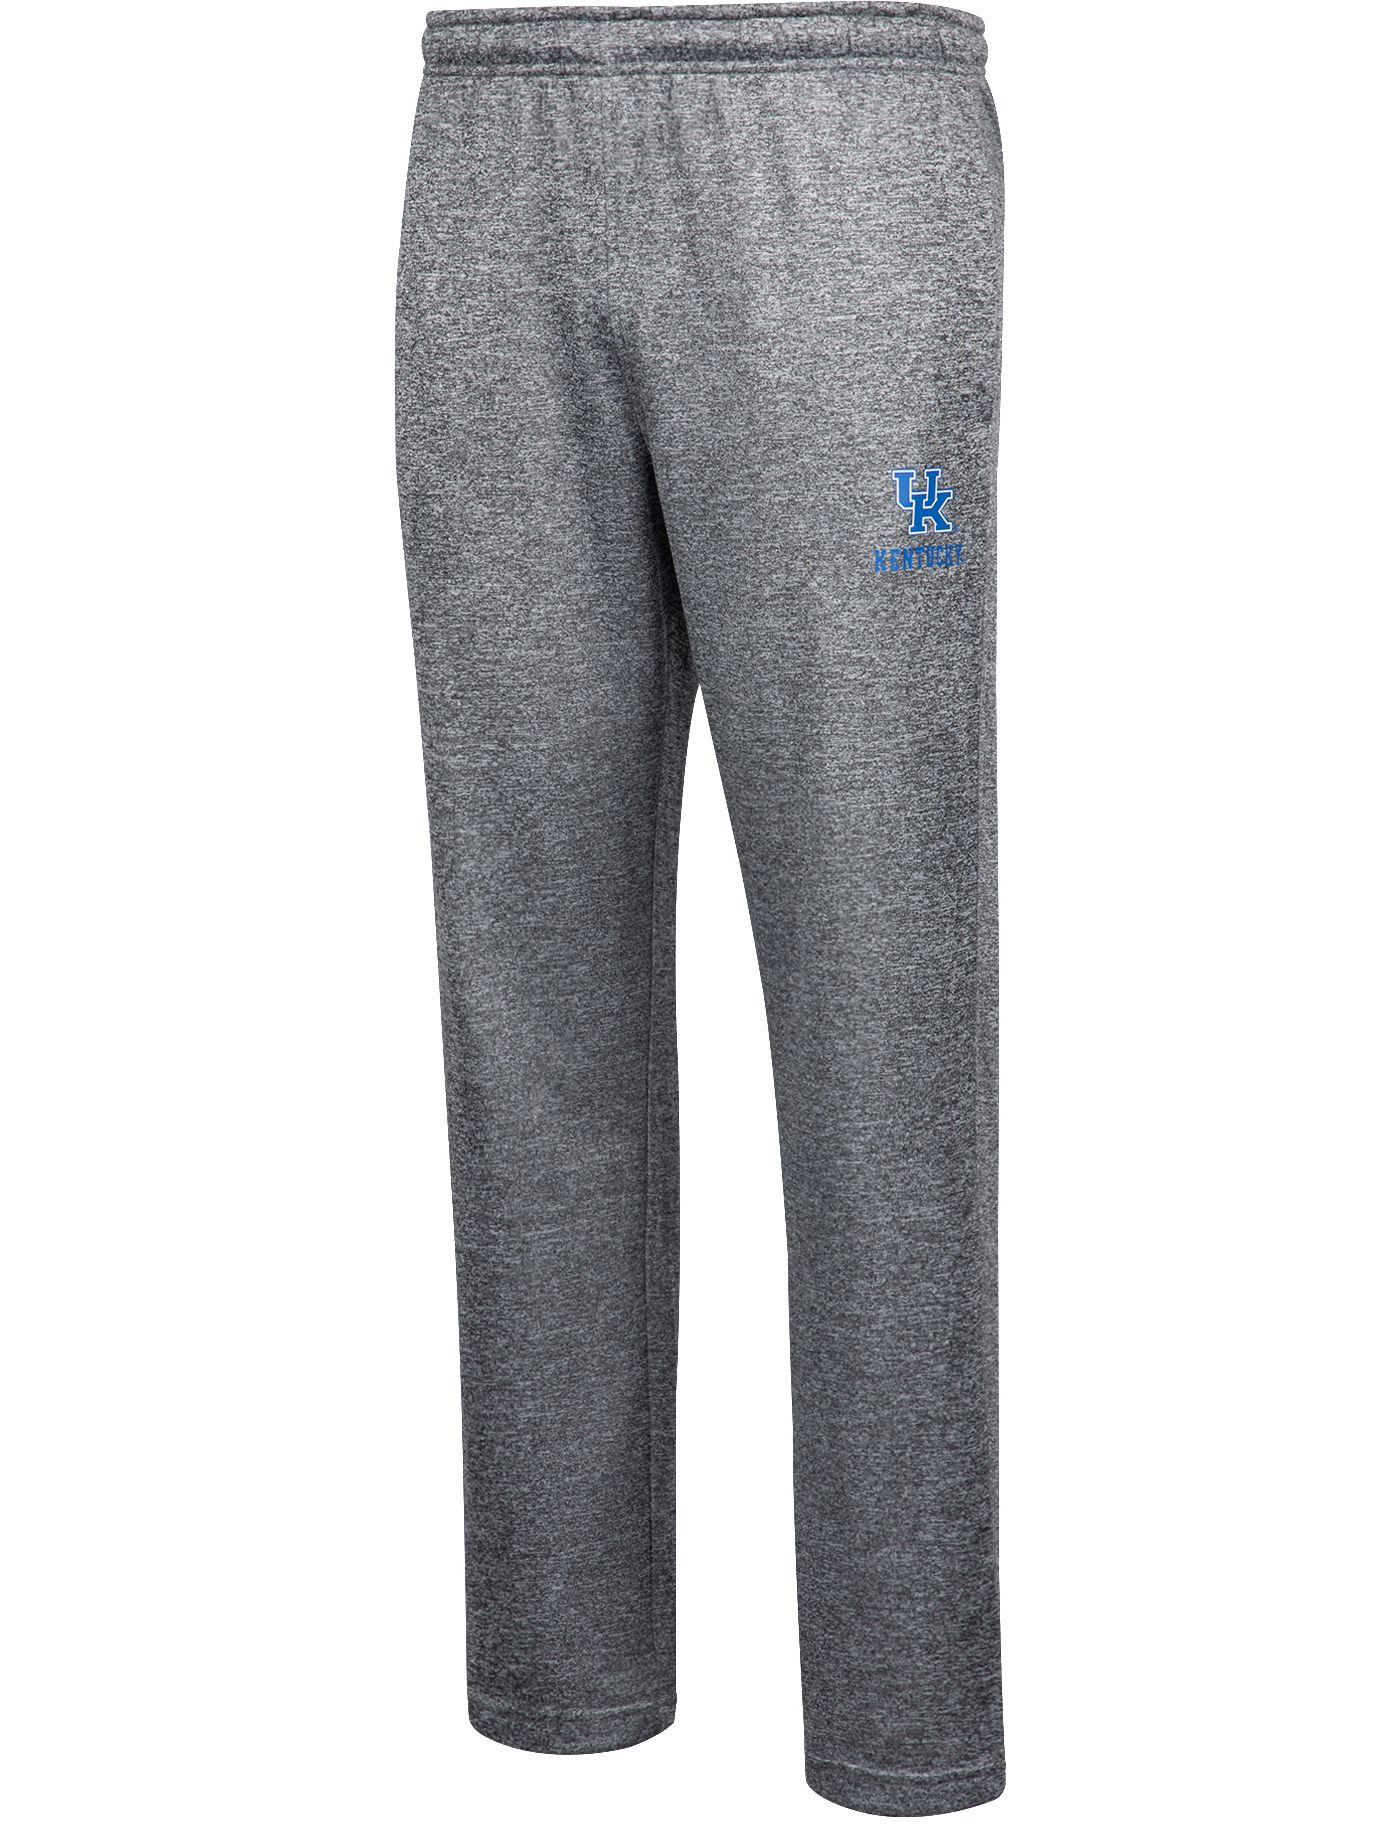 Top of the World Men's Kentucky Wildcats Grey Match-Up Pants